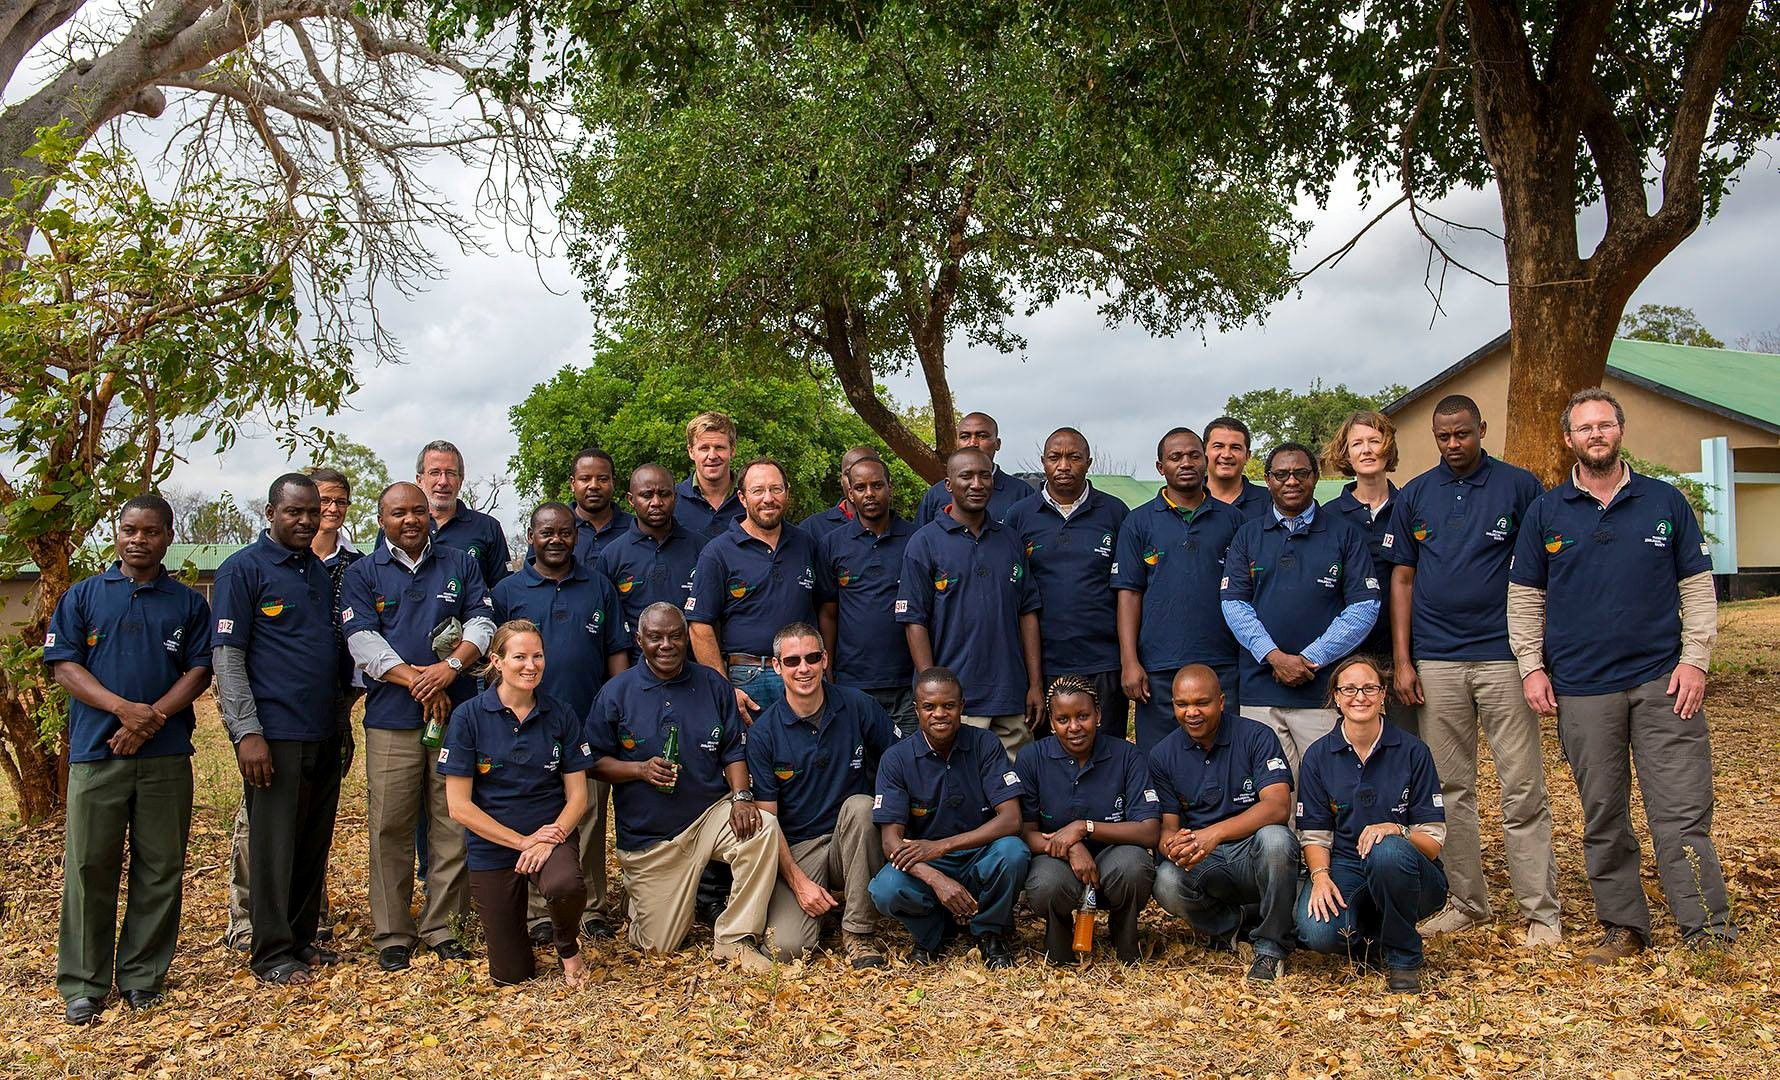 The Serengeti survey team